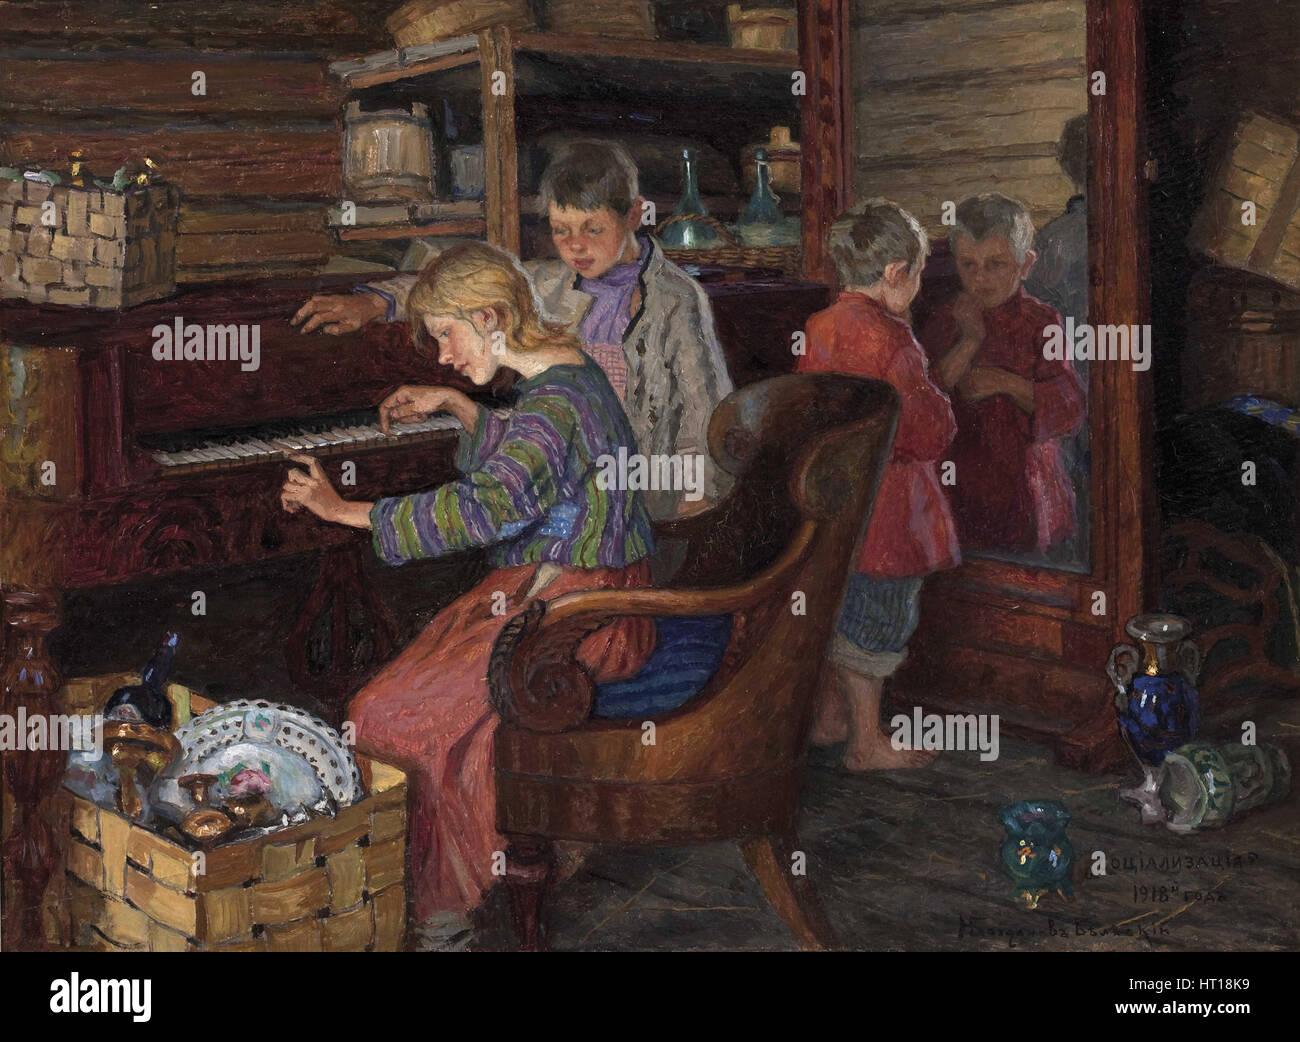 The Socialization, 1918. Artist: Bogdanov-Belsky, Nikolai Petrovich (1868-1945) - Stock Image